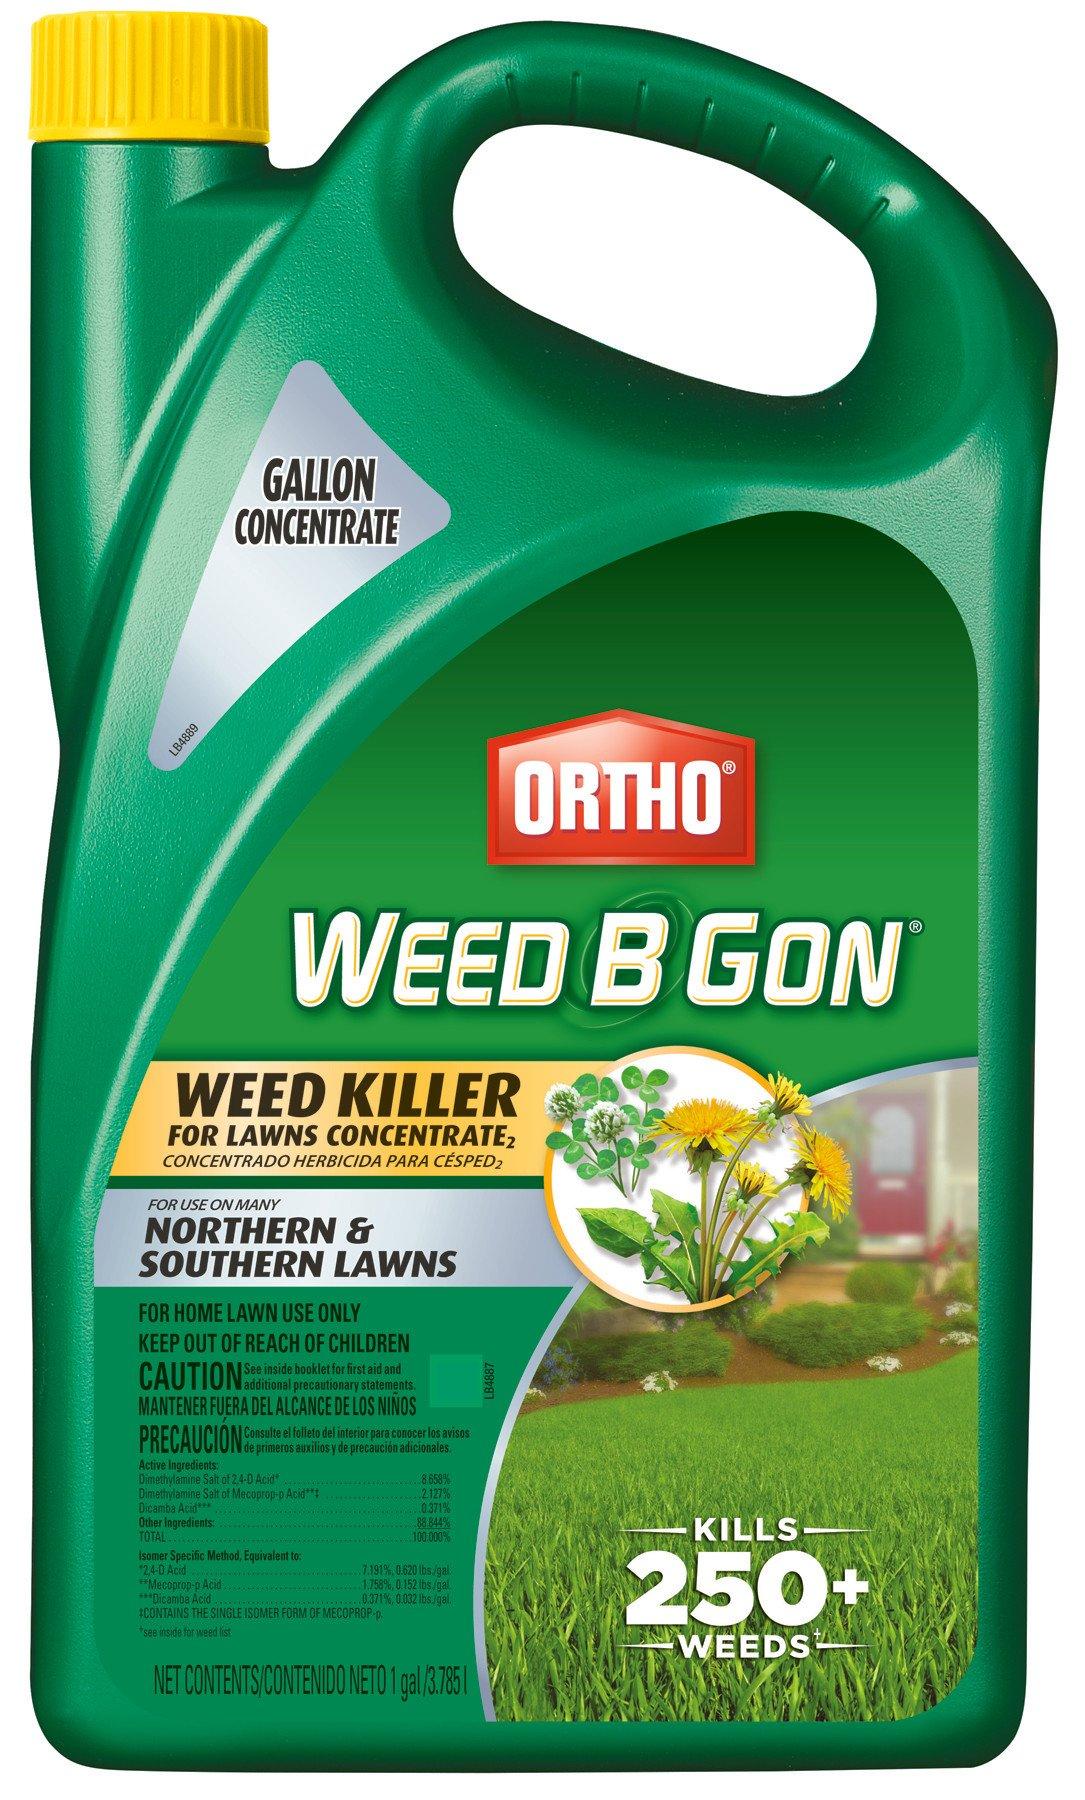 ortho weed b gon weed killer for lawns concentrate 1. Black Bedroom Furniture Sets. Home Design Ideas